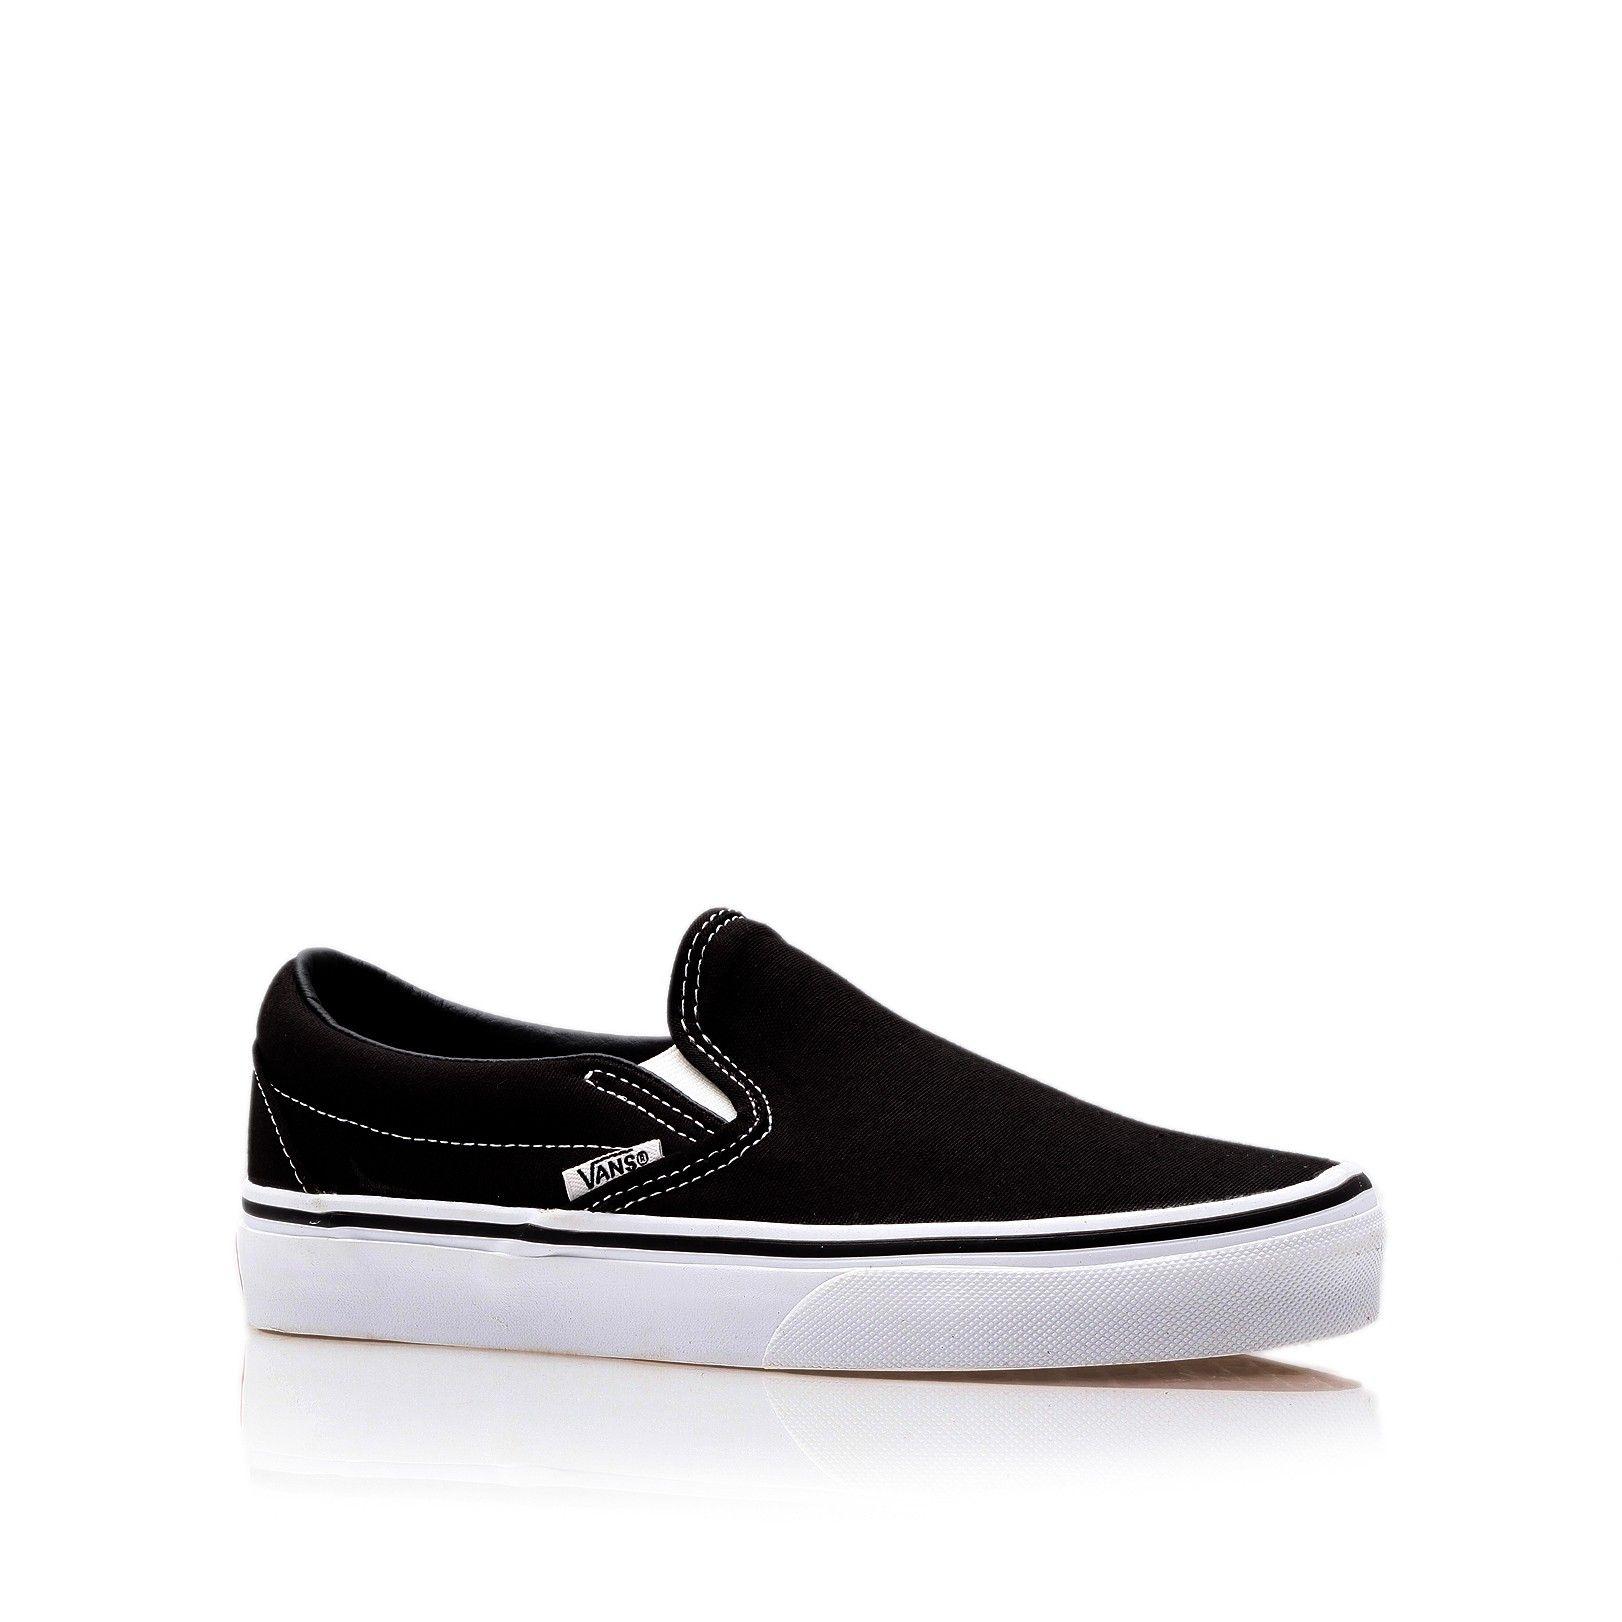 Zapatos negros Vans Knit para mujer uwwNvyns3